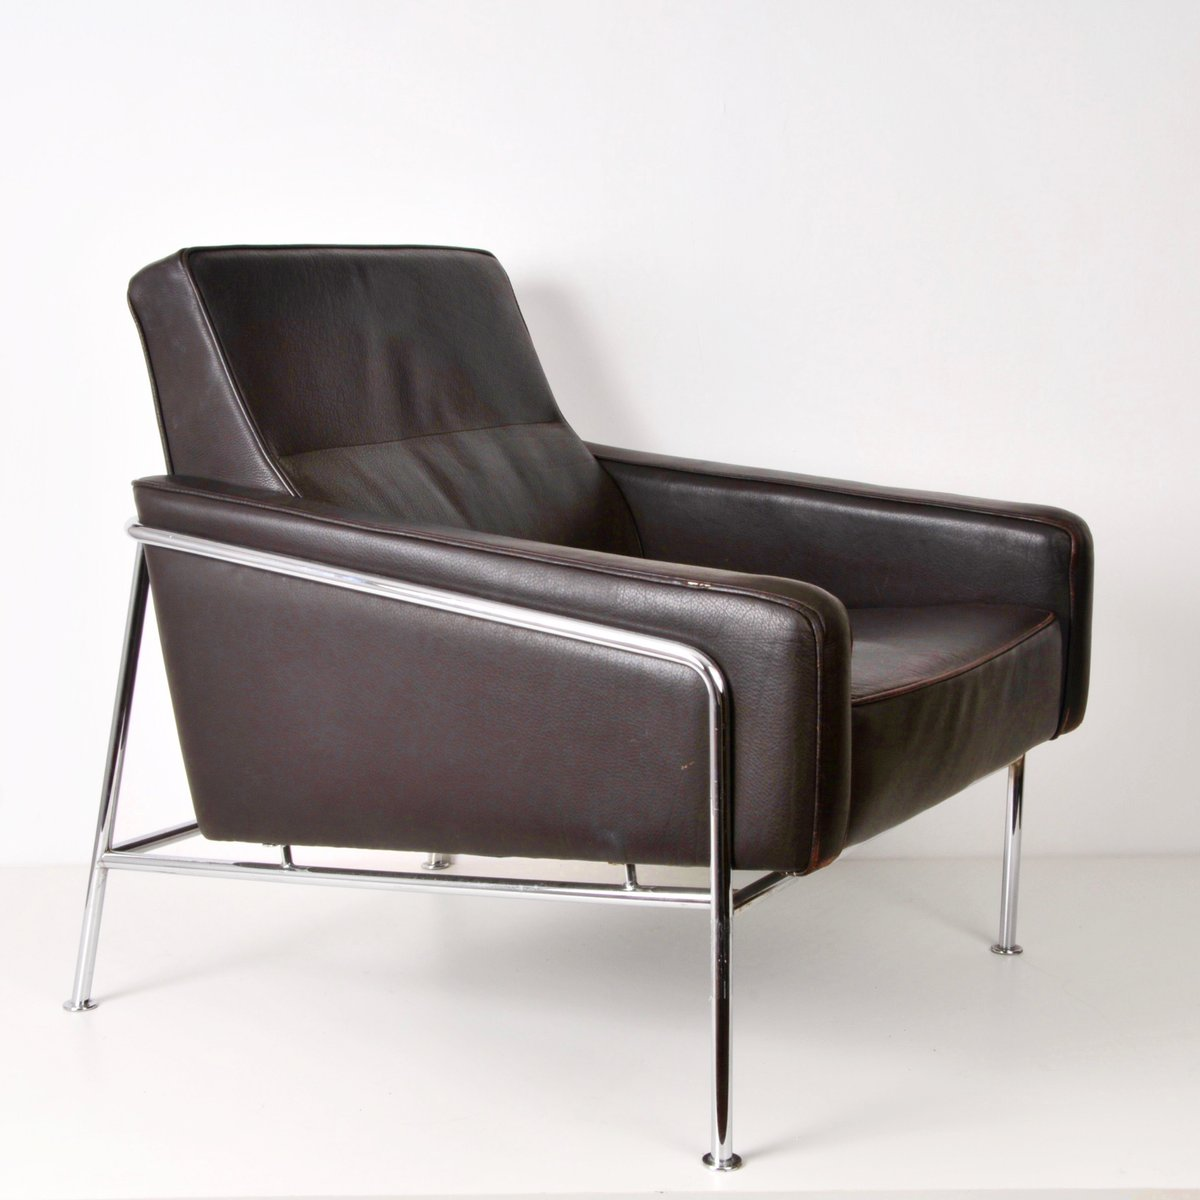 mid century sessel aus braunem leder und stahl bei pamono. Black Bedroom Furniture Sets. Home Design Ideas